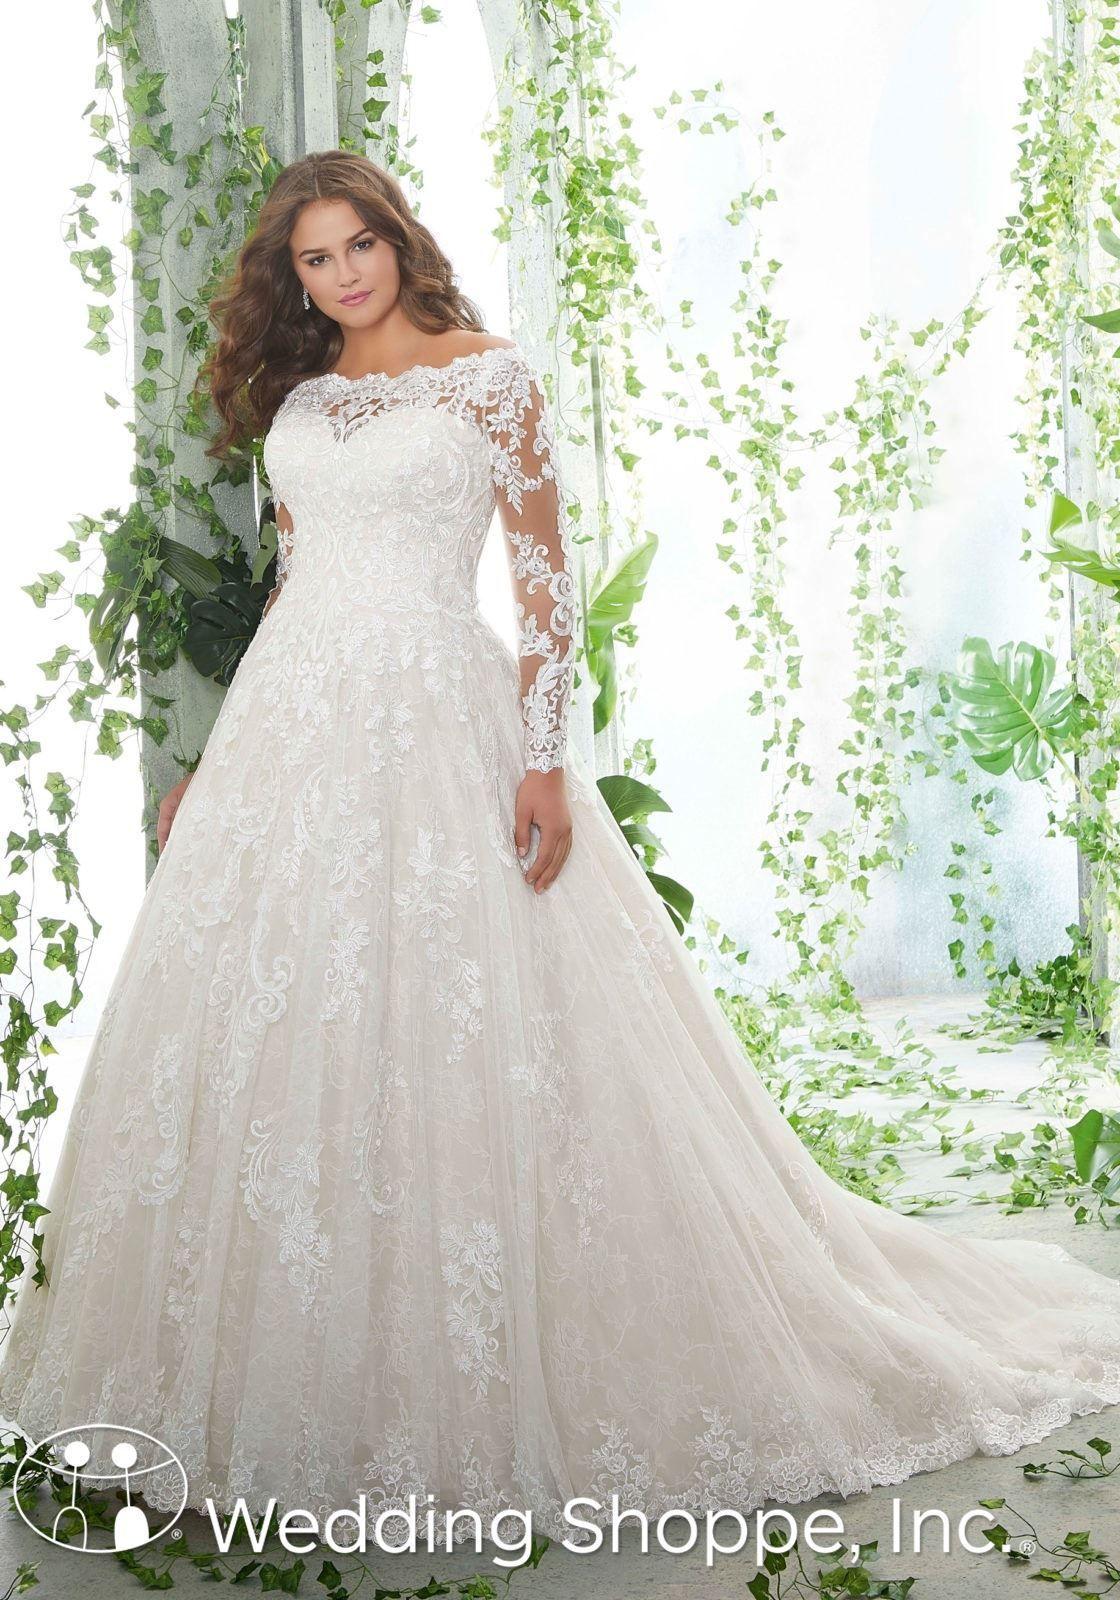 Julietta By Mori Lee Plus Size Wedding Dresses Patience 3258 Plus Wedding Dresses Ball Gowns Wedding Plus Size Wedding Gowns [ 1600 x 1120 Pixel ]